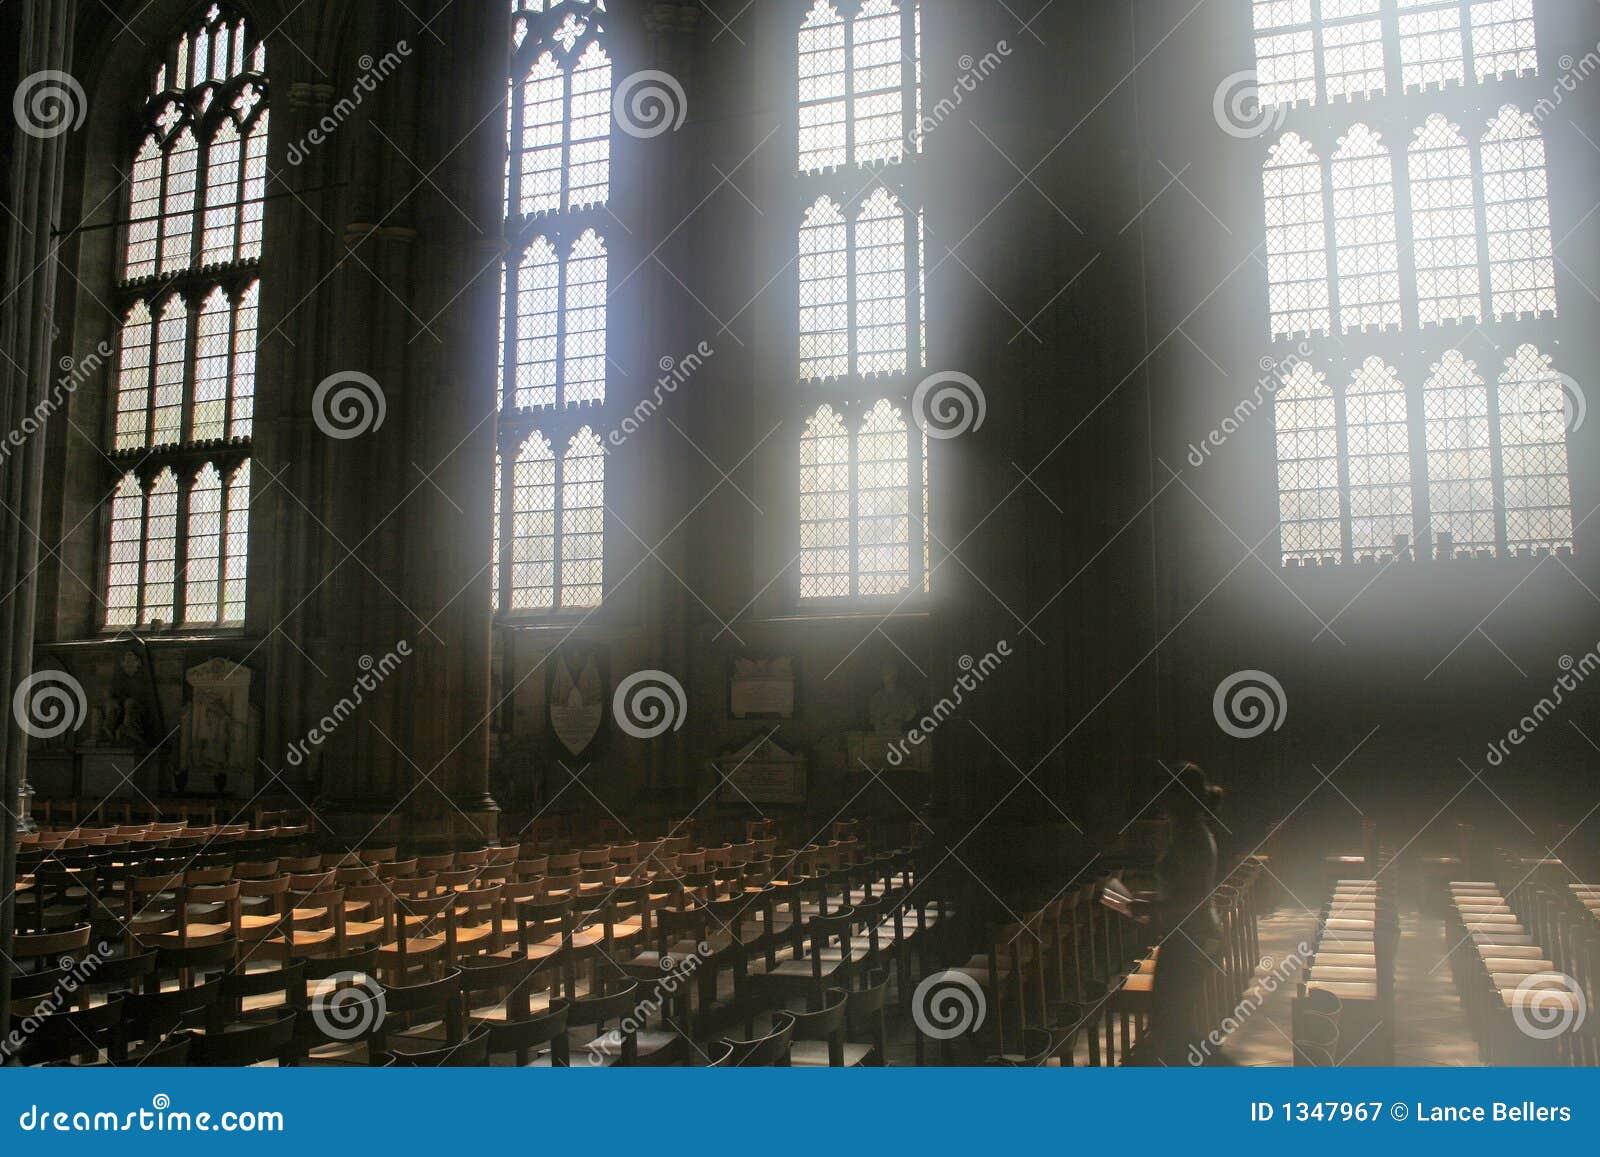 diffused light architecture - photo #43